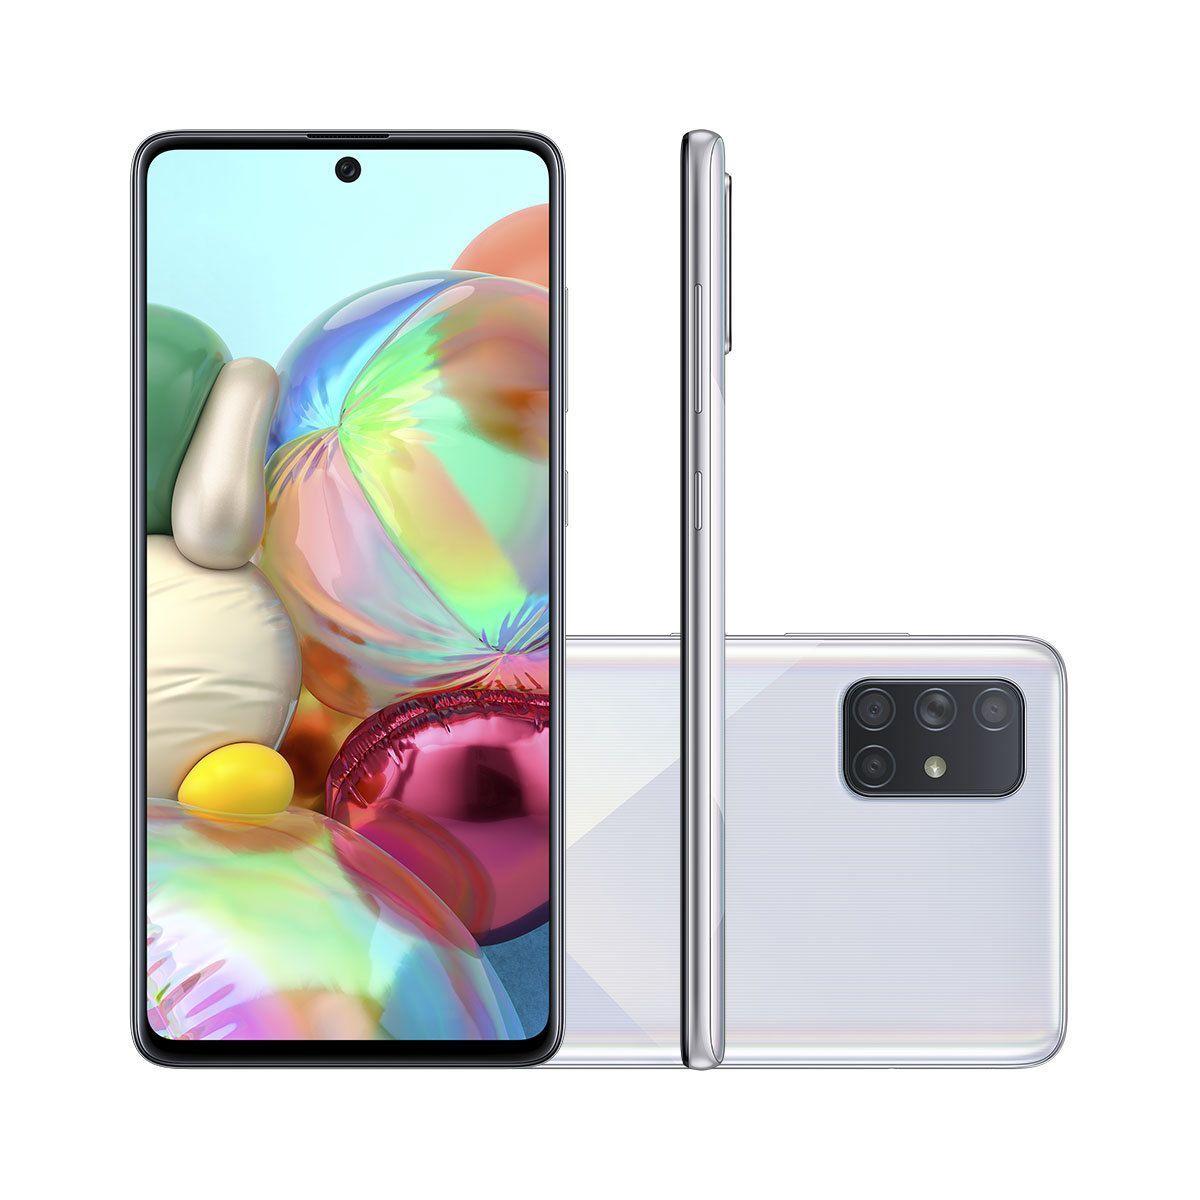 Smartphone Samsung Galaxy A71 128gb 4g Tela 6 7 Pol Camera Quadrupla 64mp Selfie 32mp Android 10 0 Samsung Galaxy Smartphone Samsung